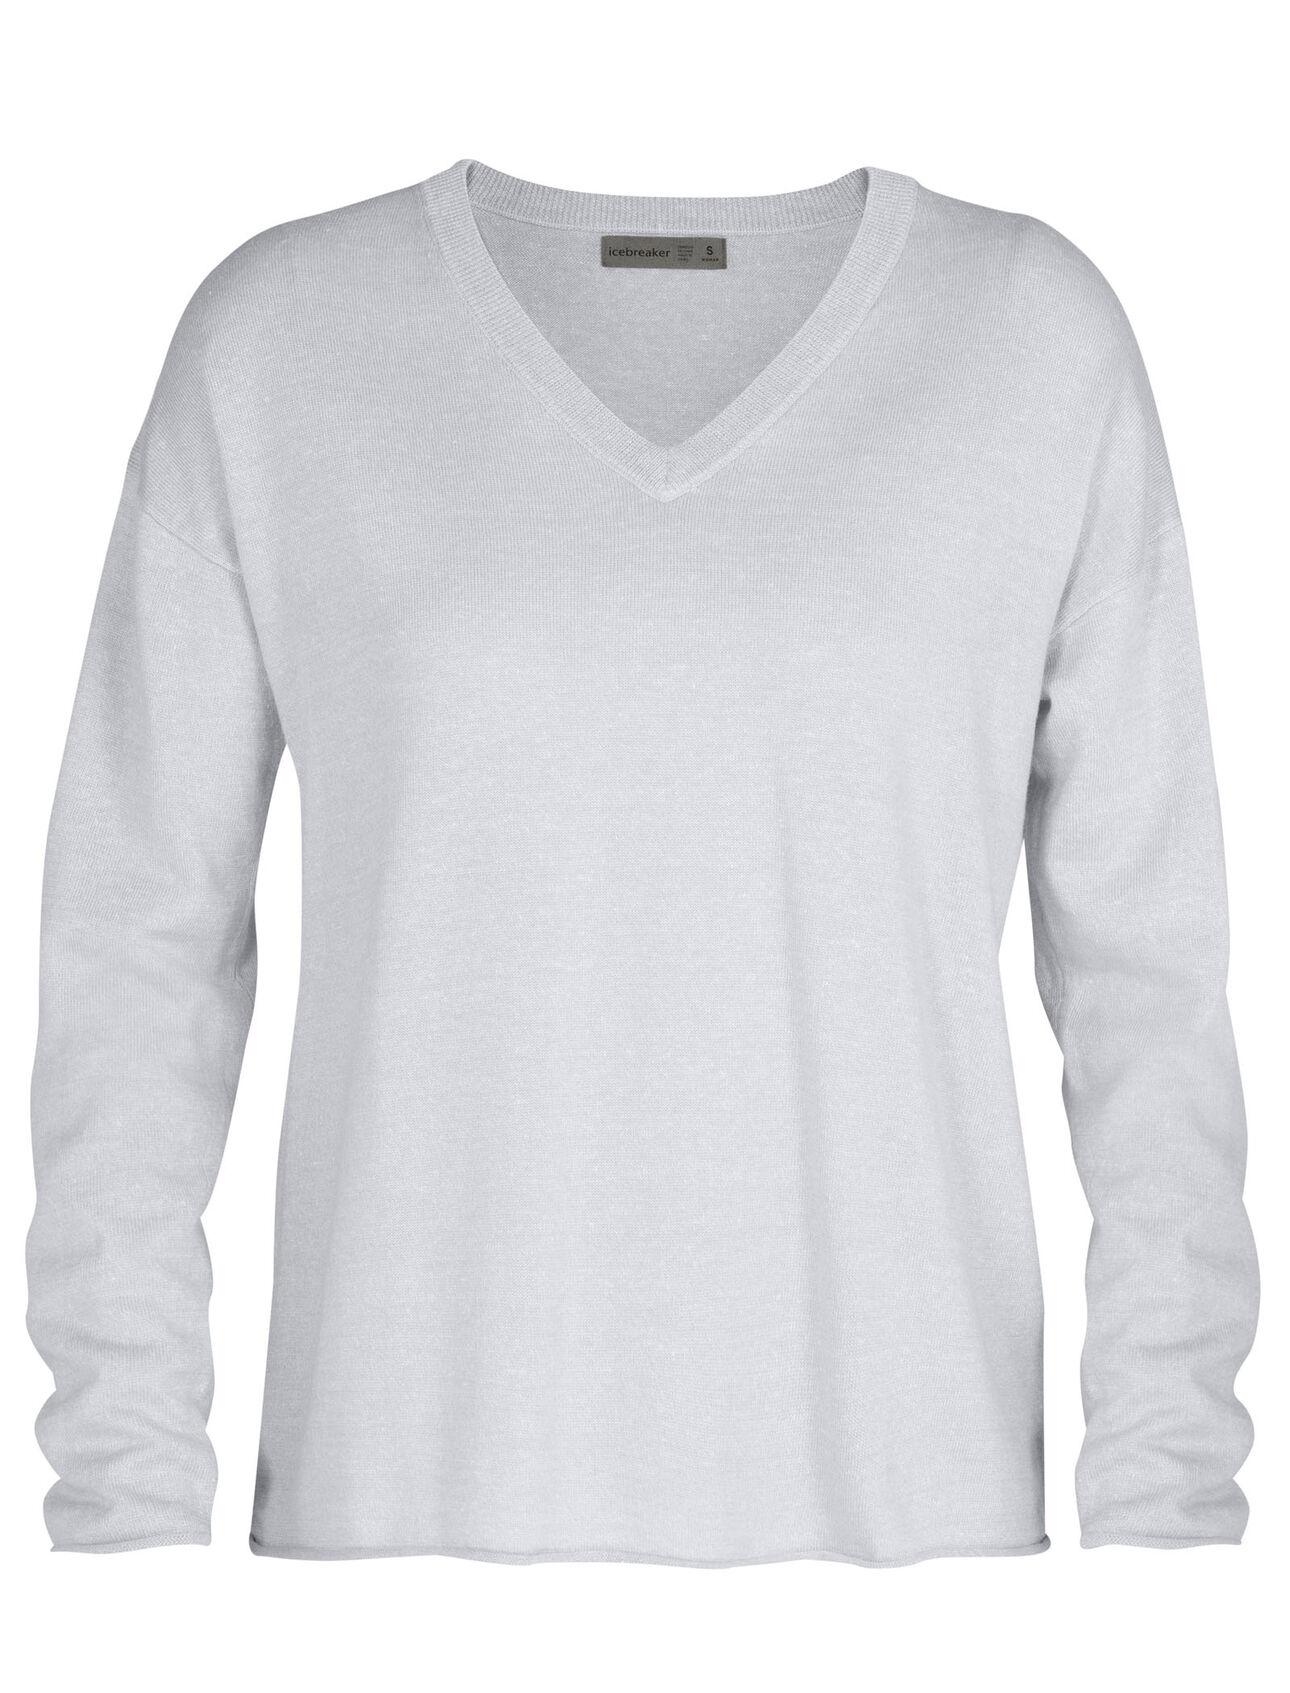 Merino Flaxen Long Sleeve V Neck Sweater